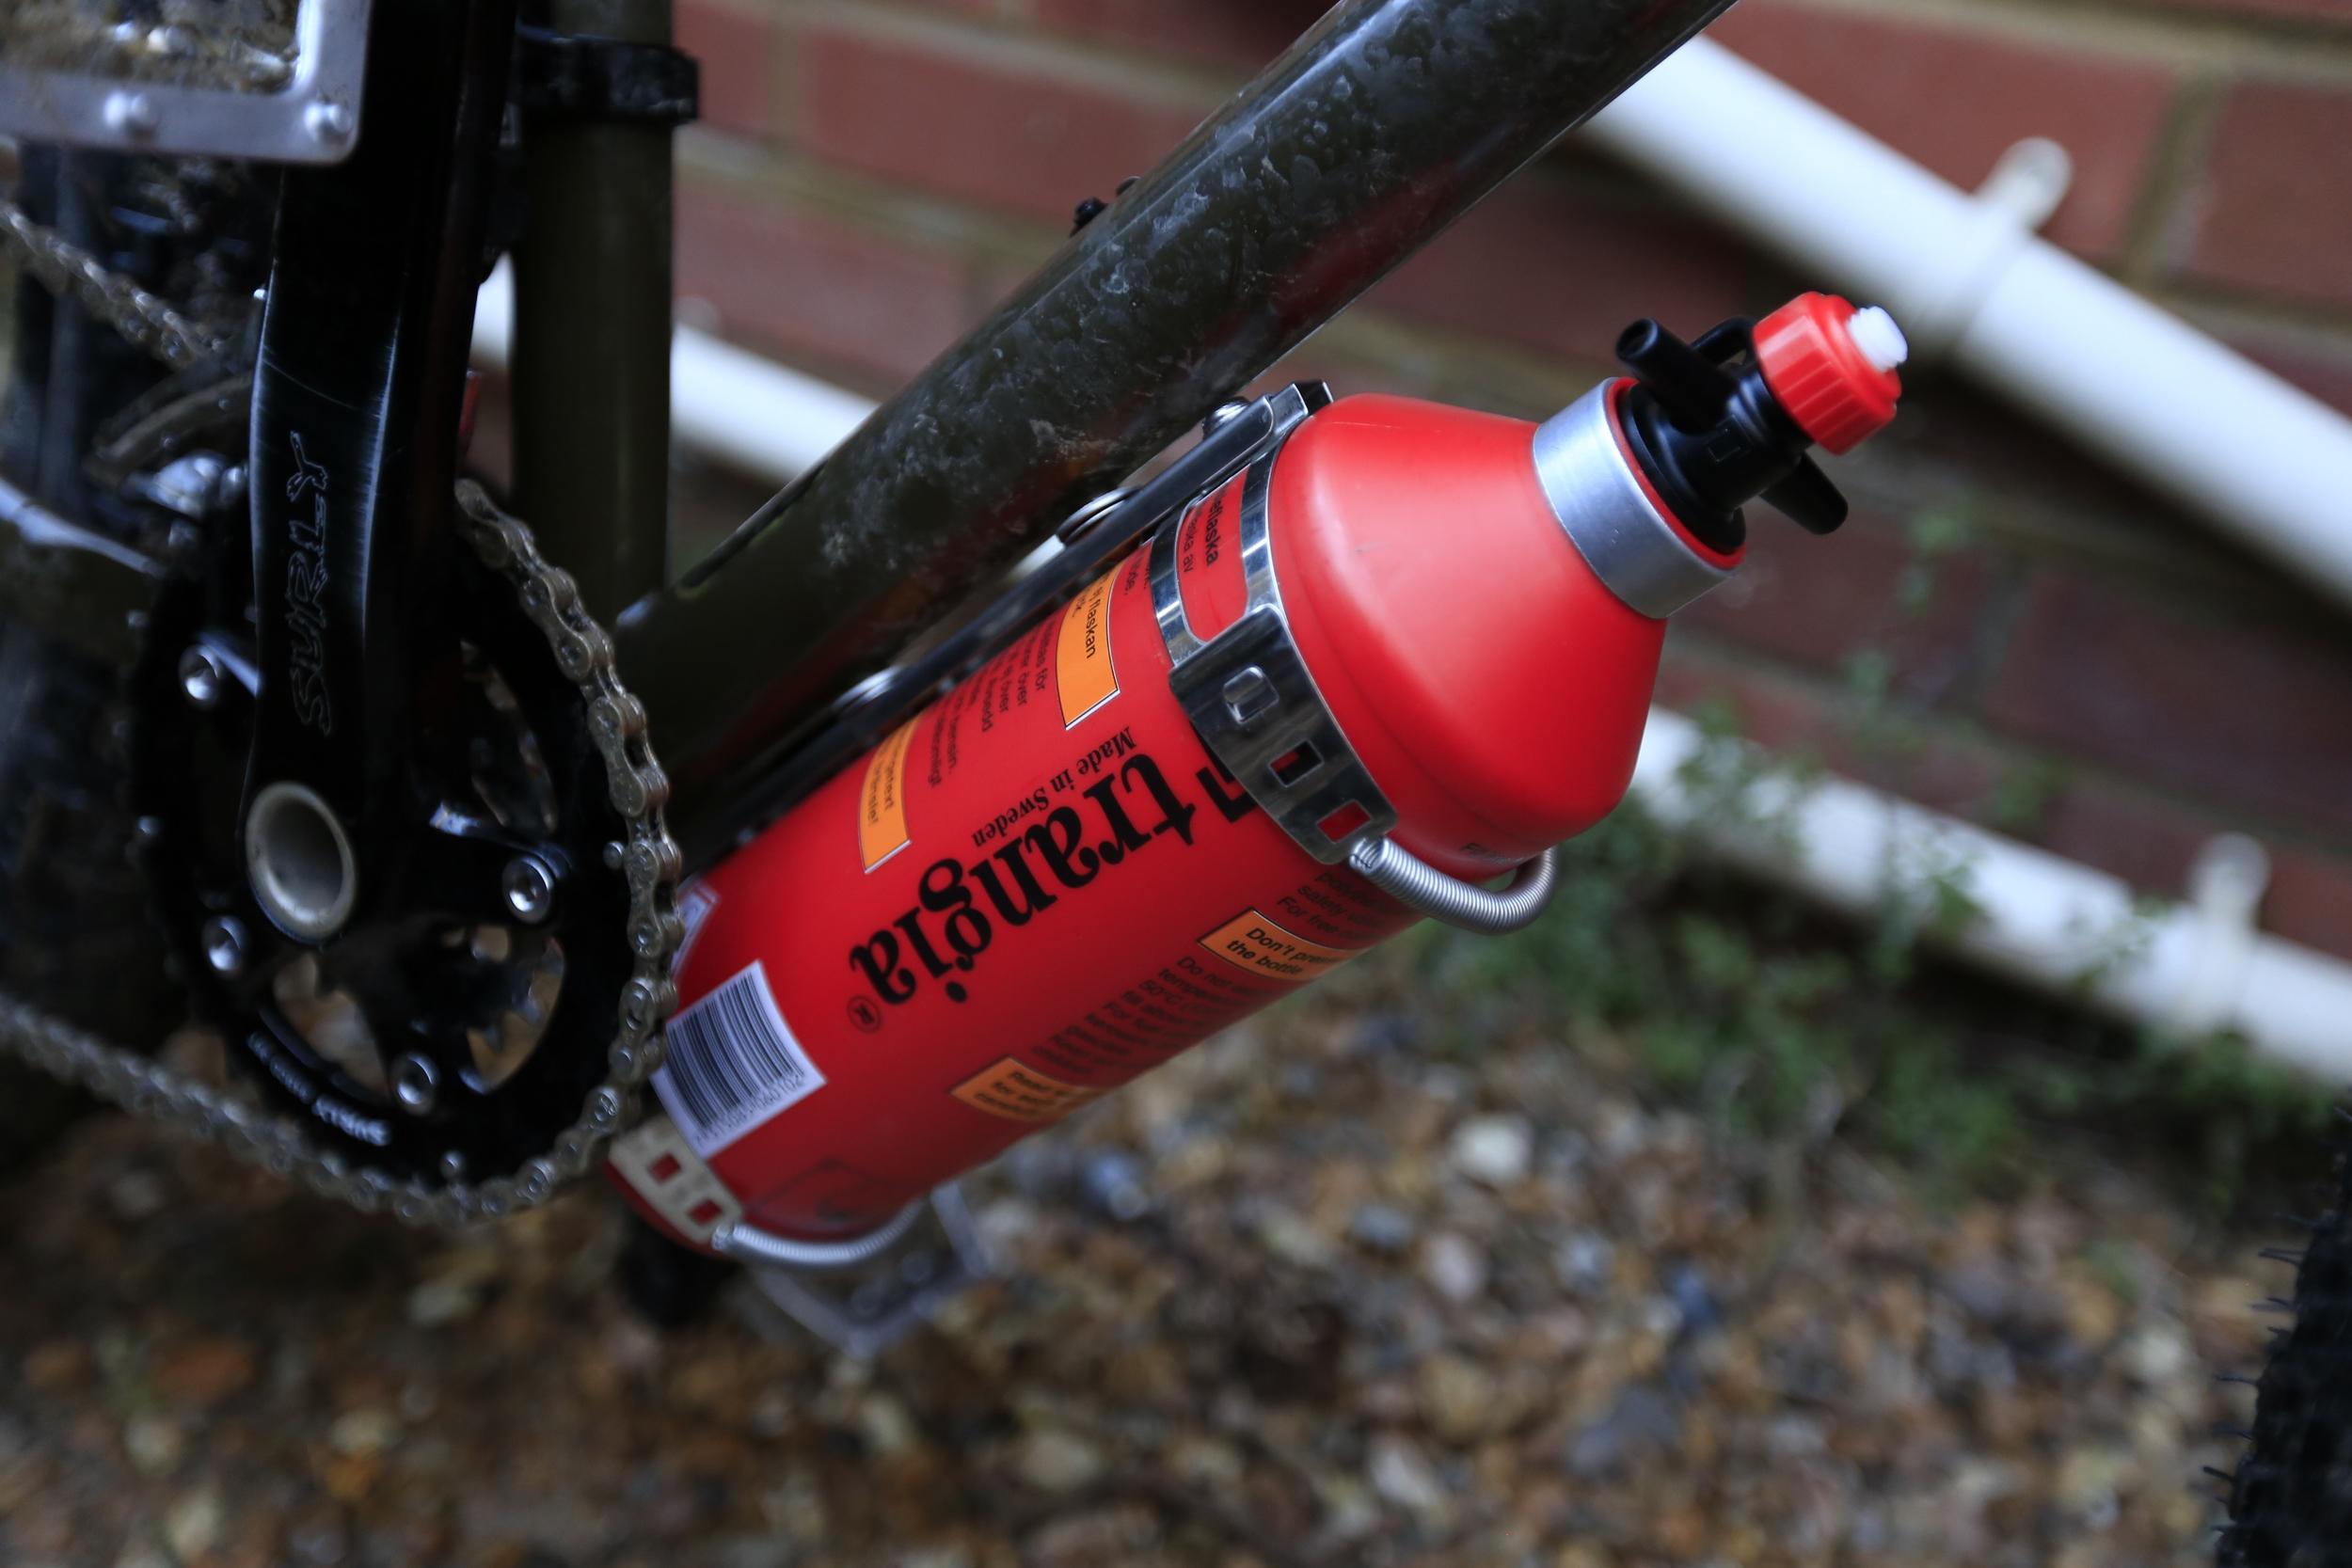 bikebuddy, bikebuddy mk3, bikepacking, cycle touring, touring blog, bicycle touring apocalypse, surly, surly ecr, steel frame, cycling, bottle holder, touring bottle holder